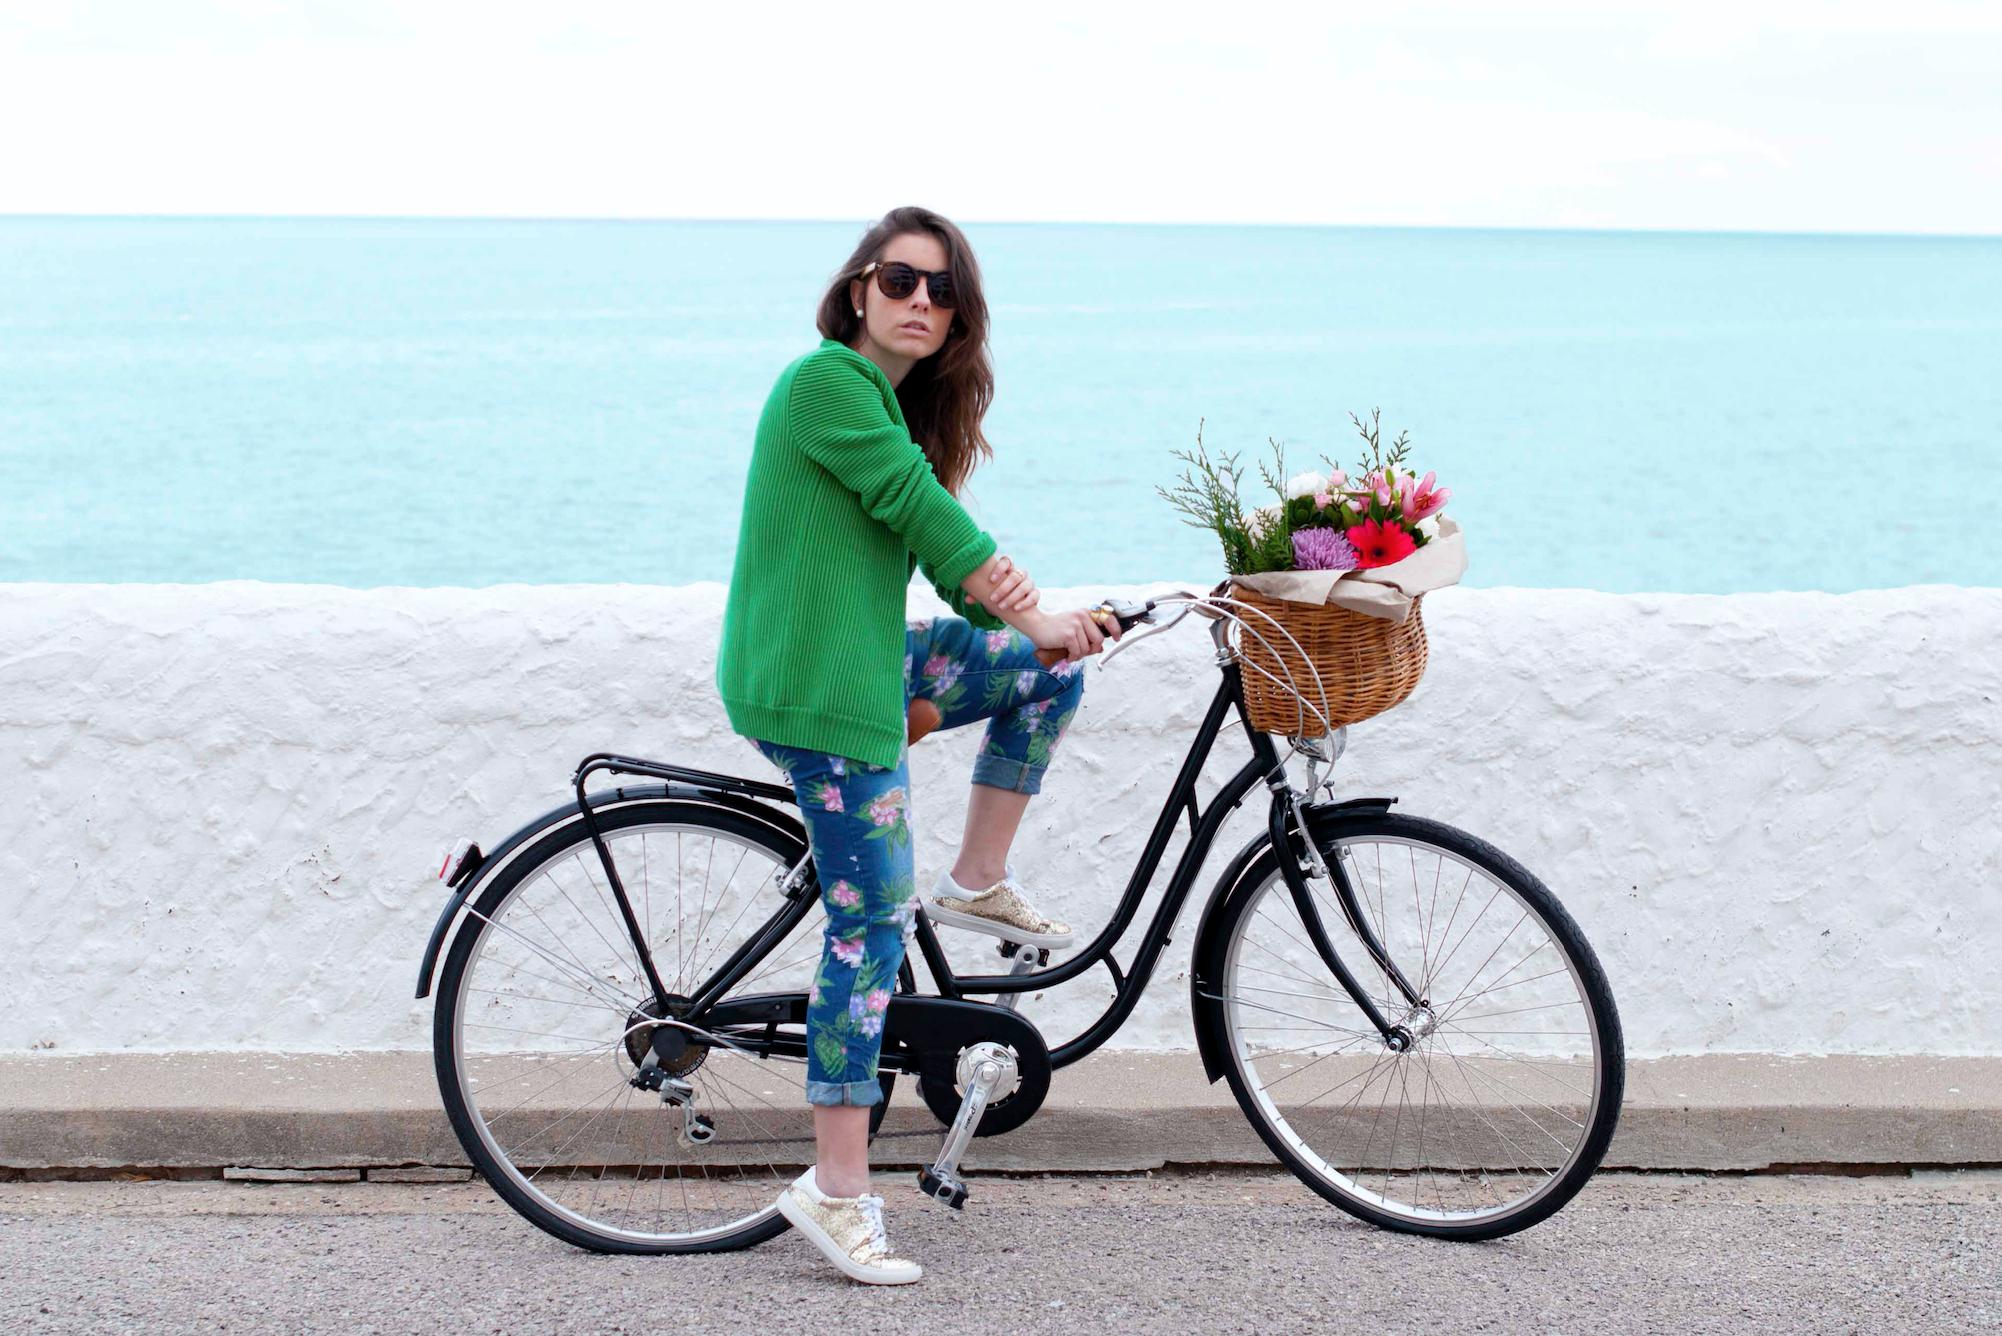 http://bit.ly/alohaspring  #theguestgirl #spring #inspo #march #bike #primavera #diadelafelicidad #happy #sunrise #beauty #flowers #inspiration #hpreppy #preppy #highlypreppy #style #streetstyle #overall #stylebike #inspobike #biciclasica #green #newin #details #pink #heimstone #glitter #sneaker #gold #jewels